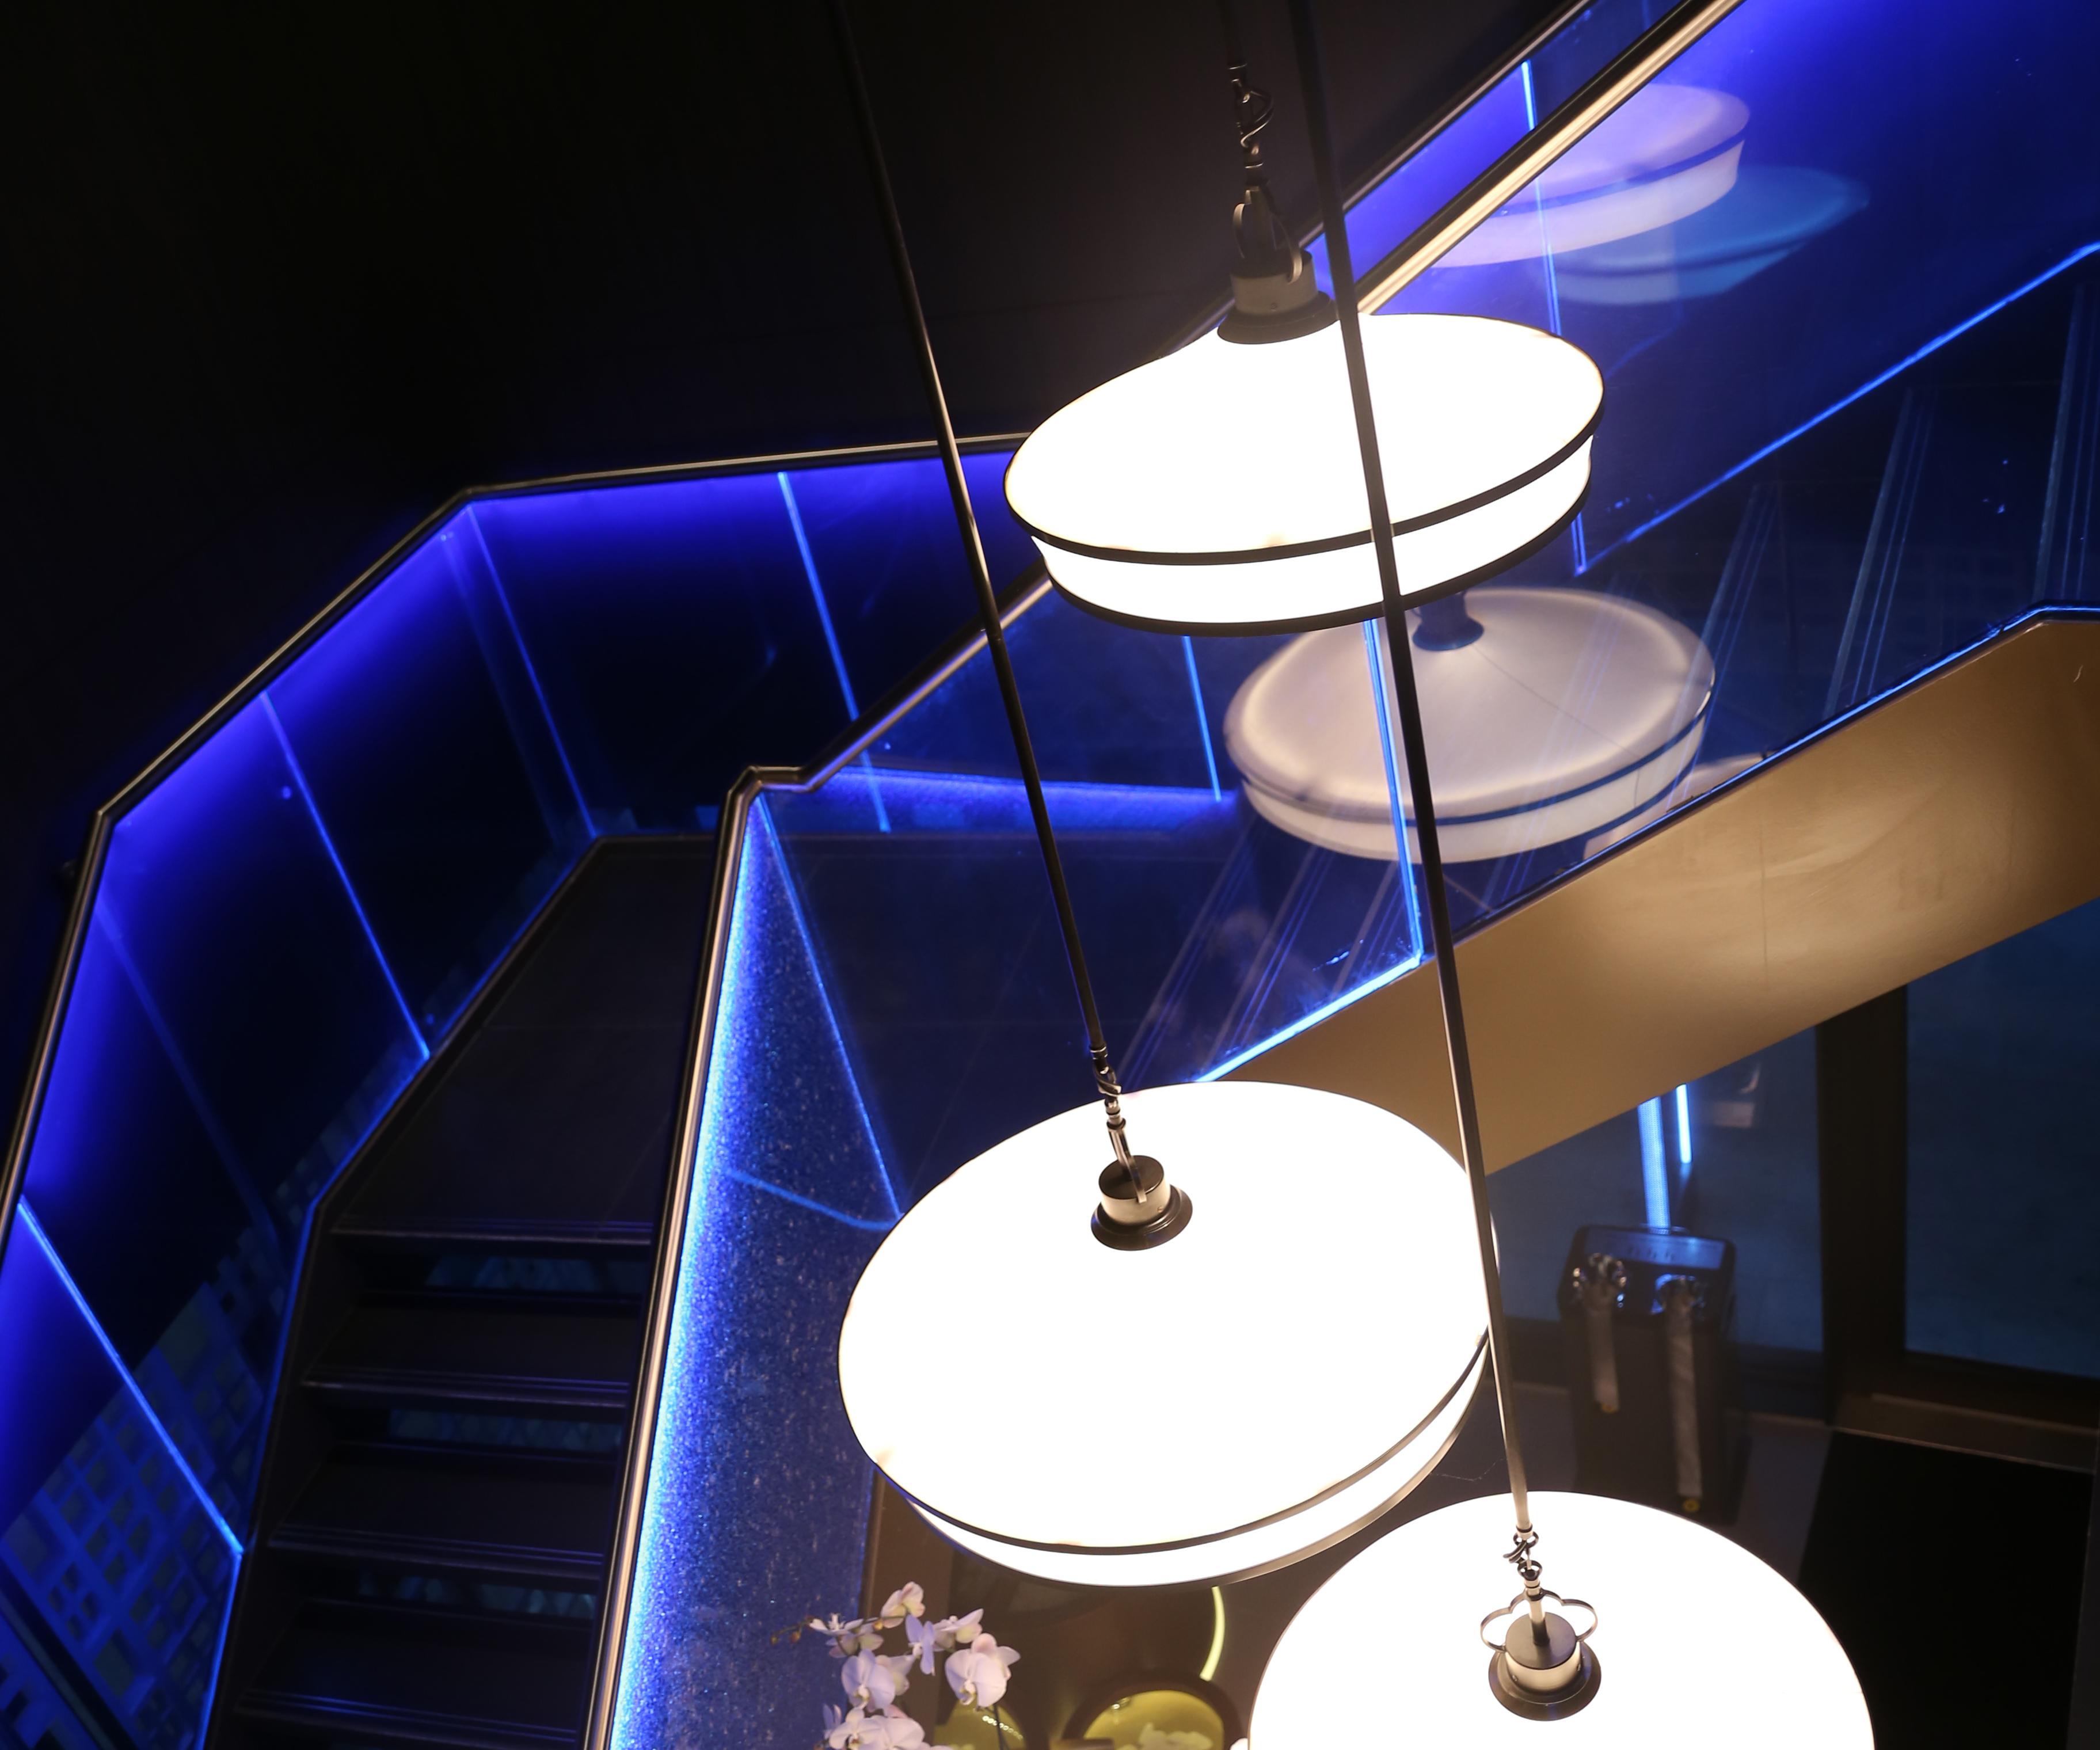 blue-staircase-yuatcha-city-broadgate-circle-london-mjlighting-2-2